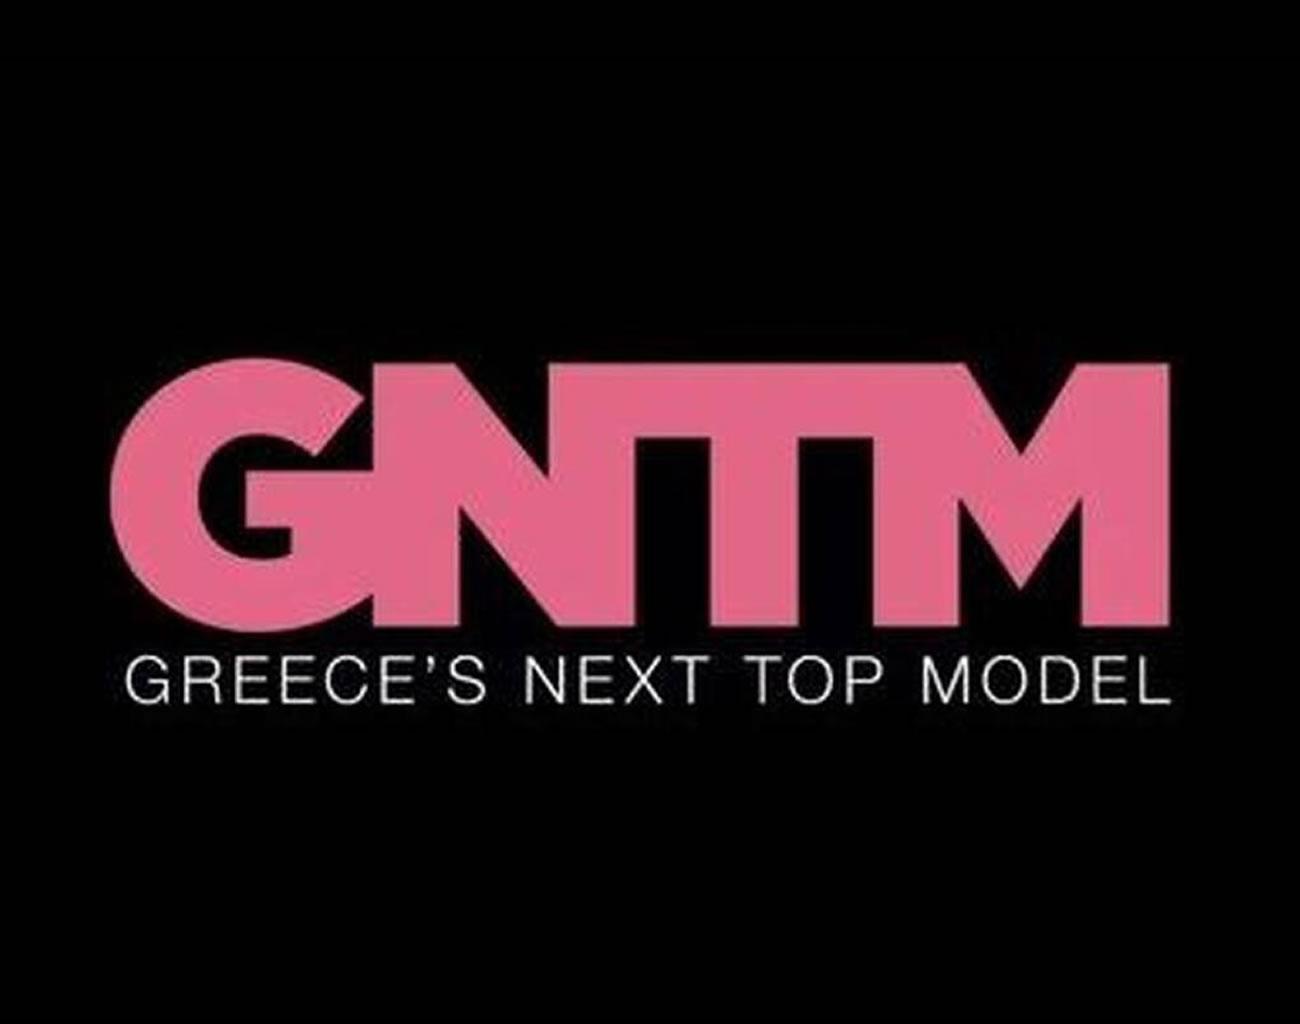 GNTM, GNTM Spoiler